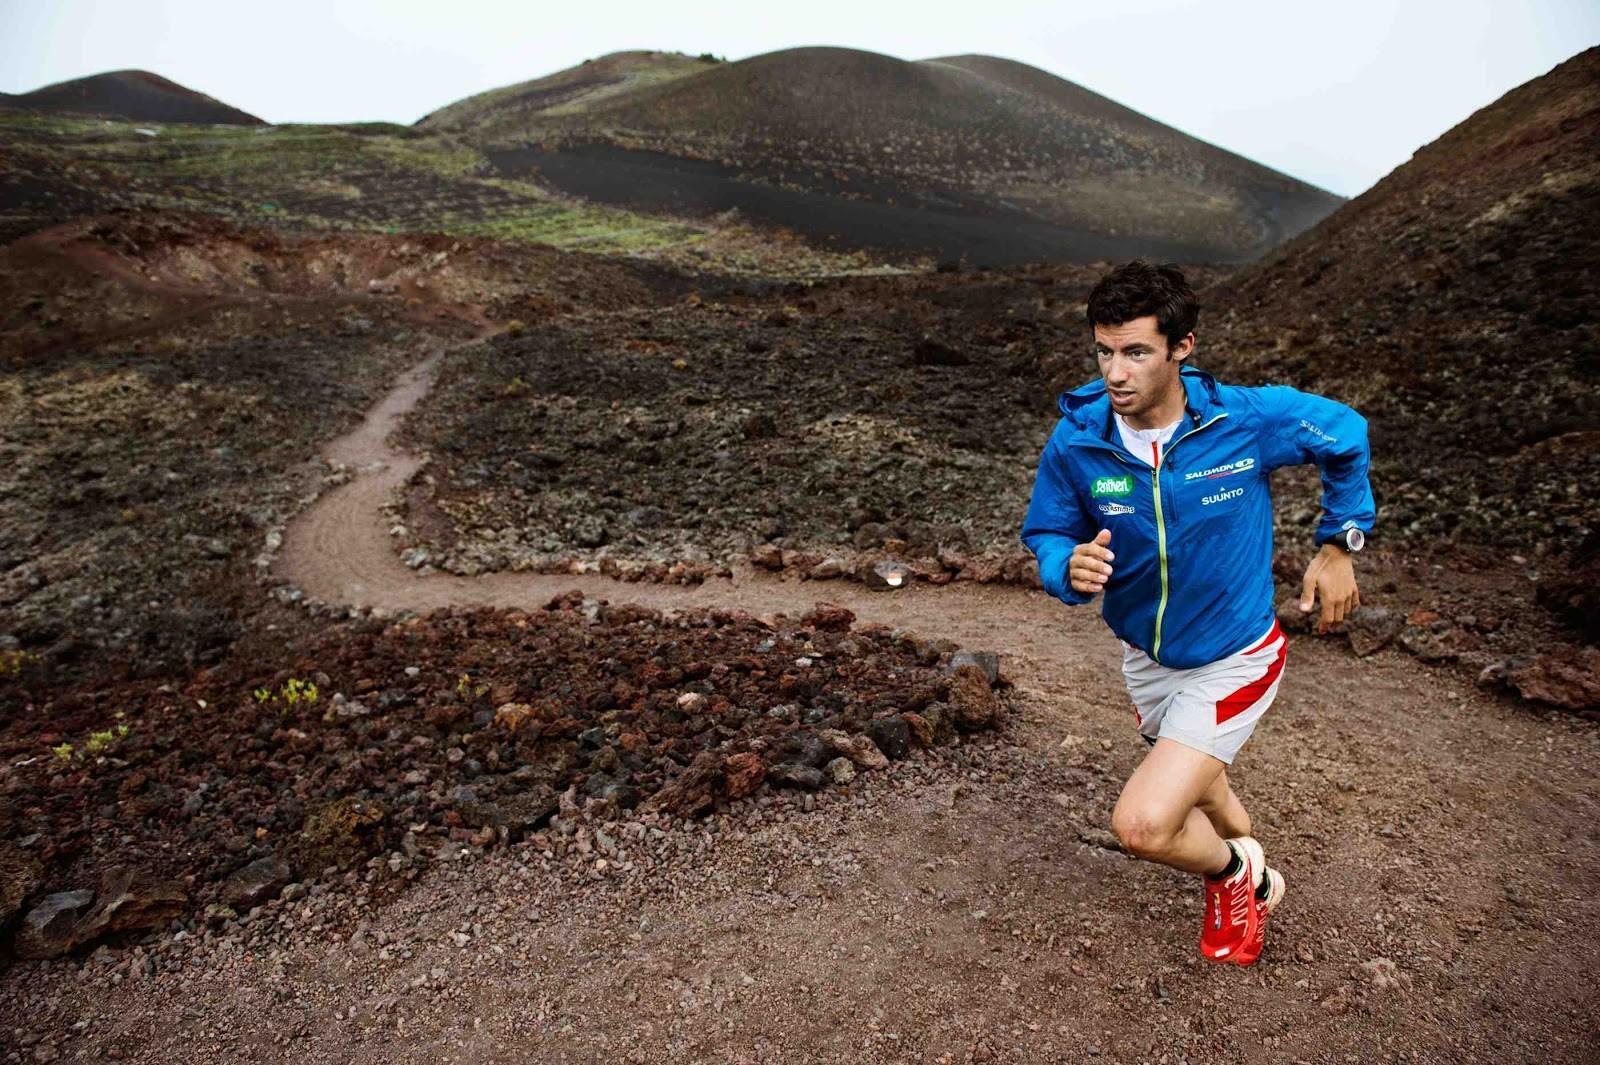 Trail Running, ¿próximo deporte olímpico?